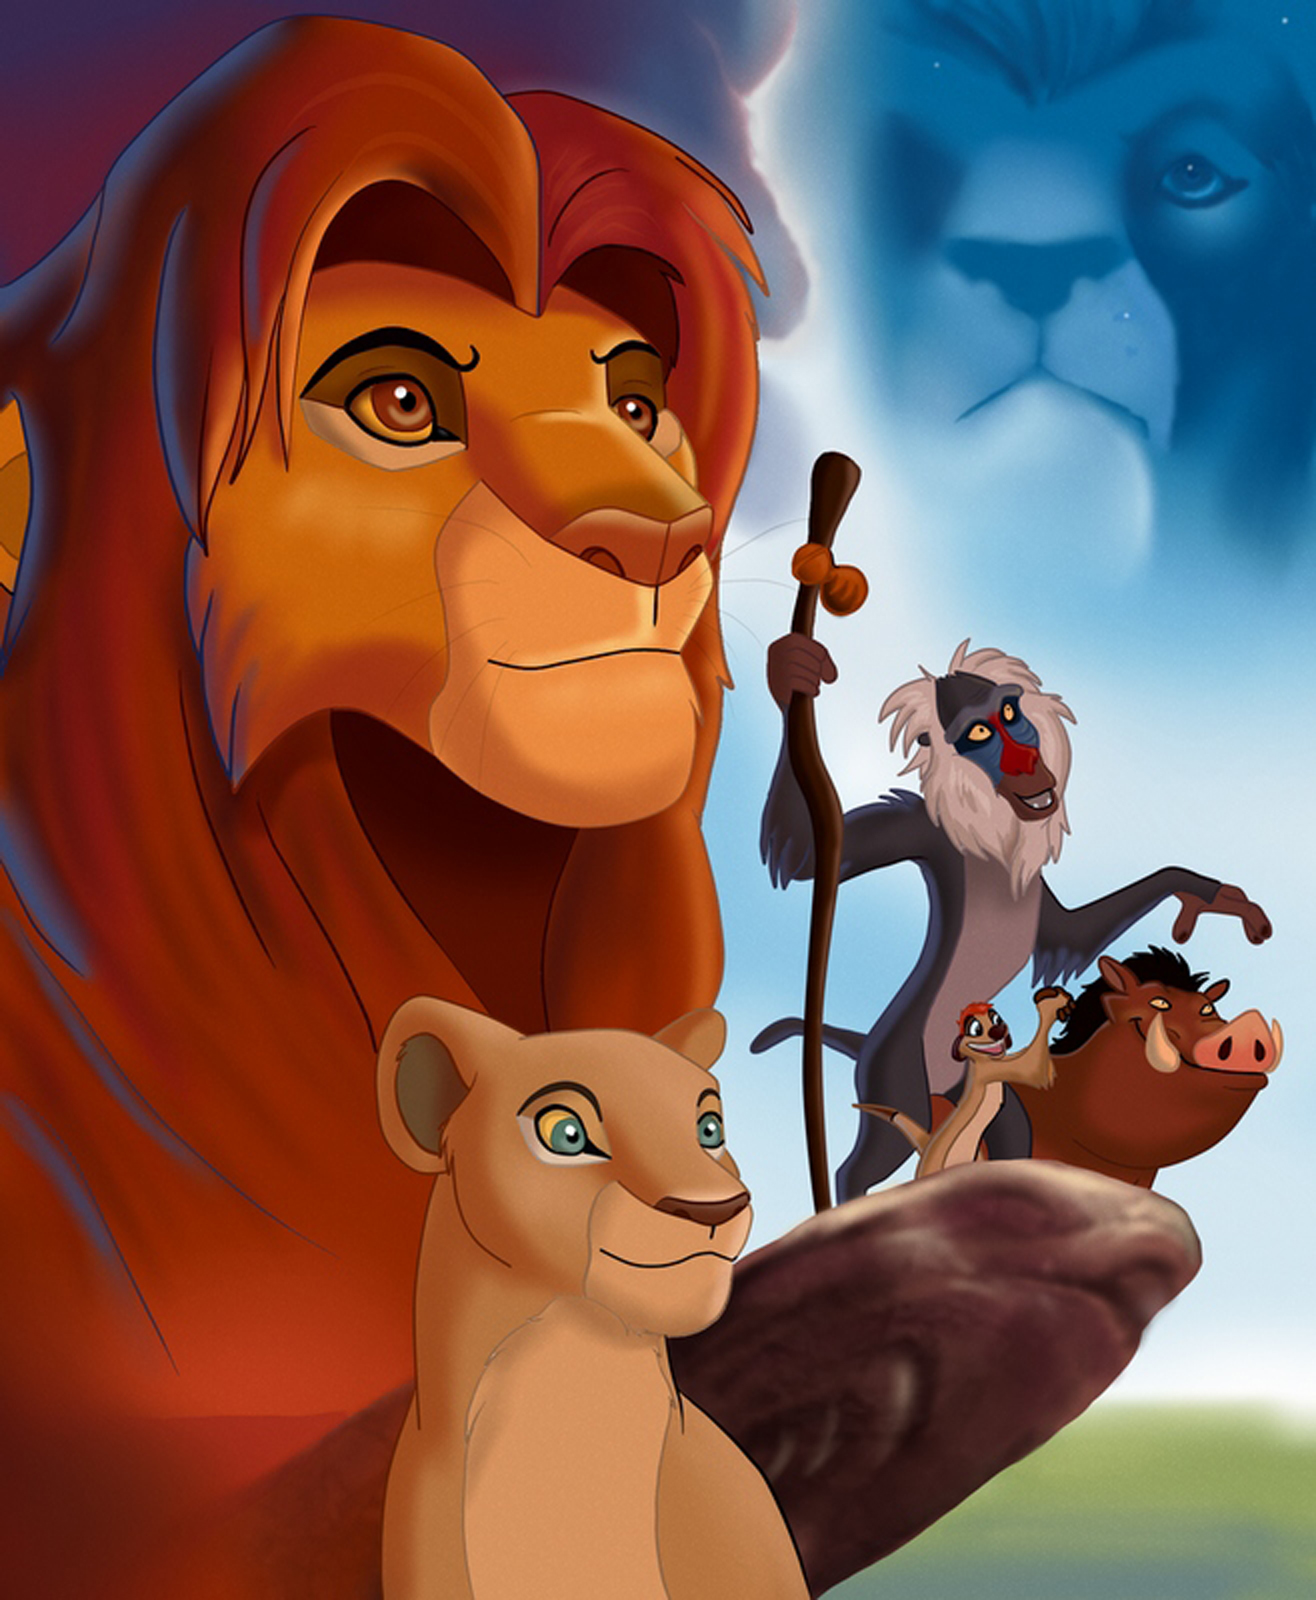 Lion king mufasa wallpaper - photo#23